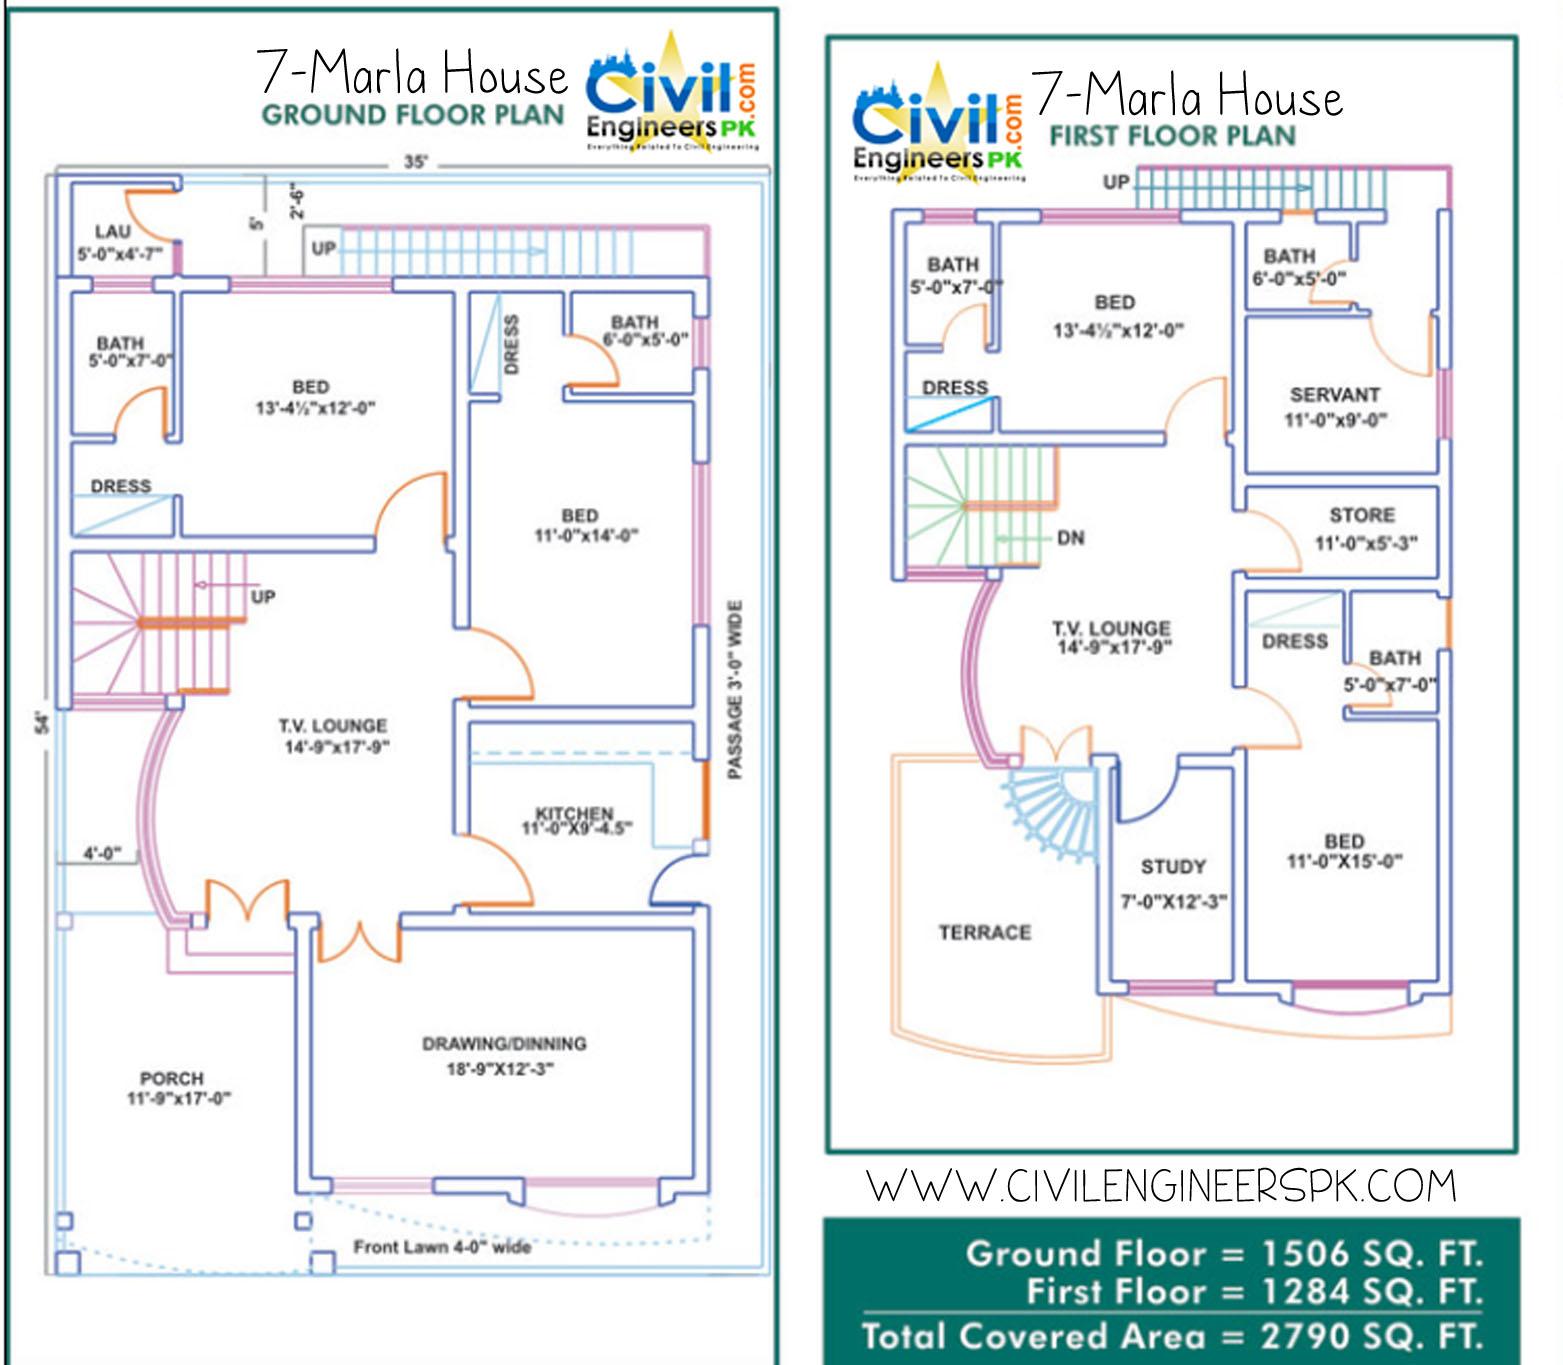 House Maps 5 Marla Plan 7 marla house